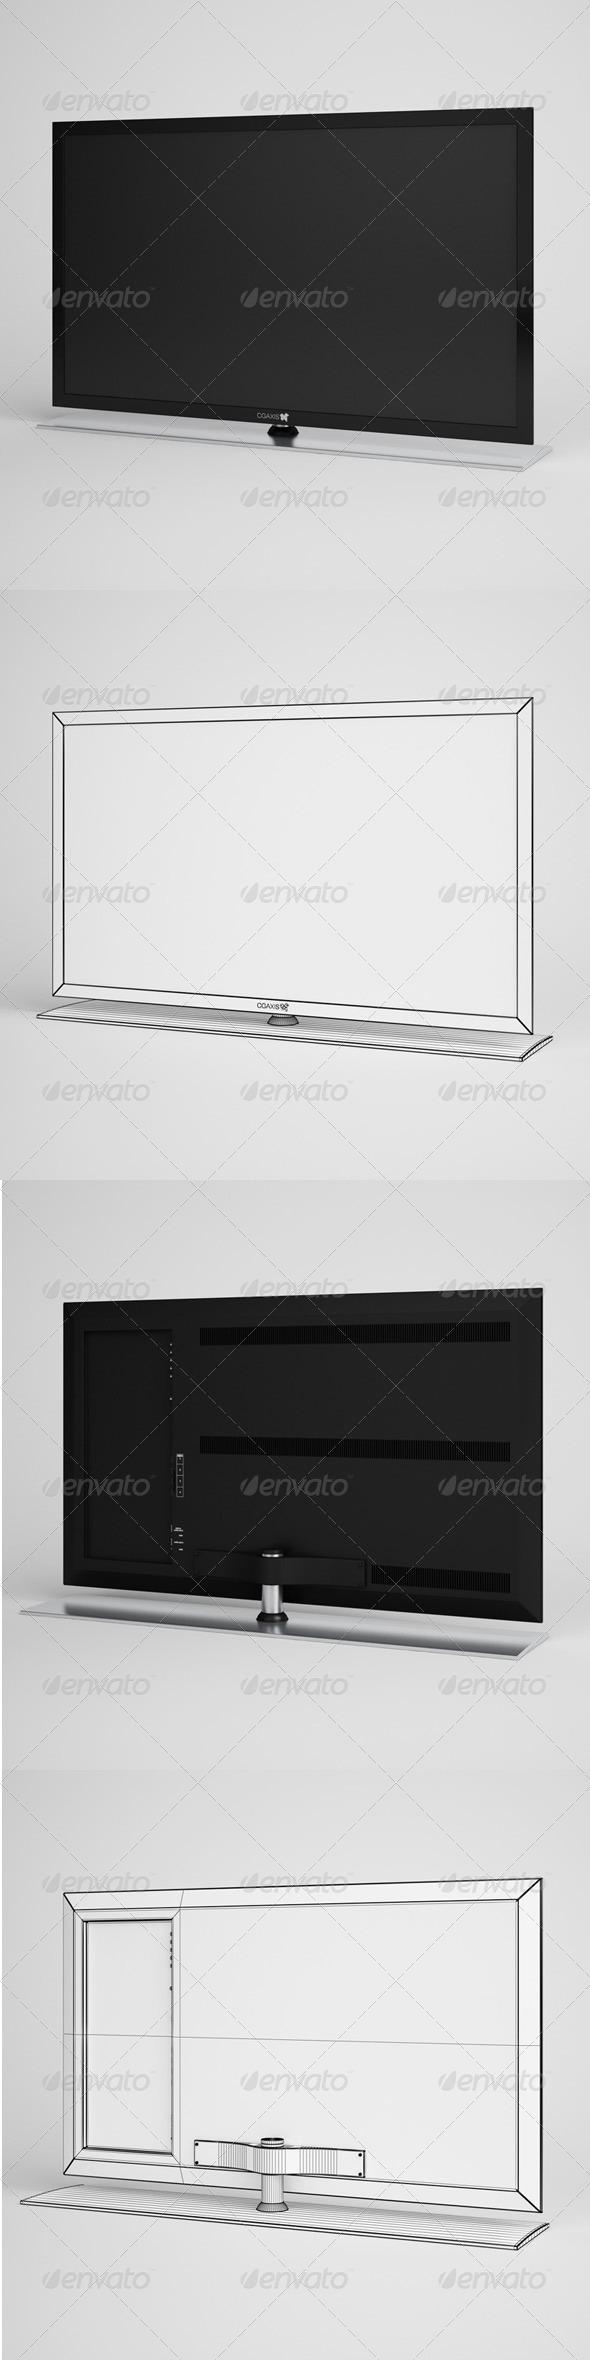 3DOcean CGAxis Flatscreen TV Electronics 03 165743